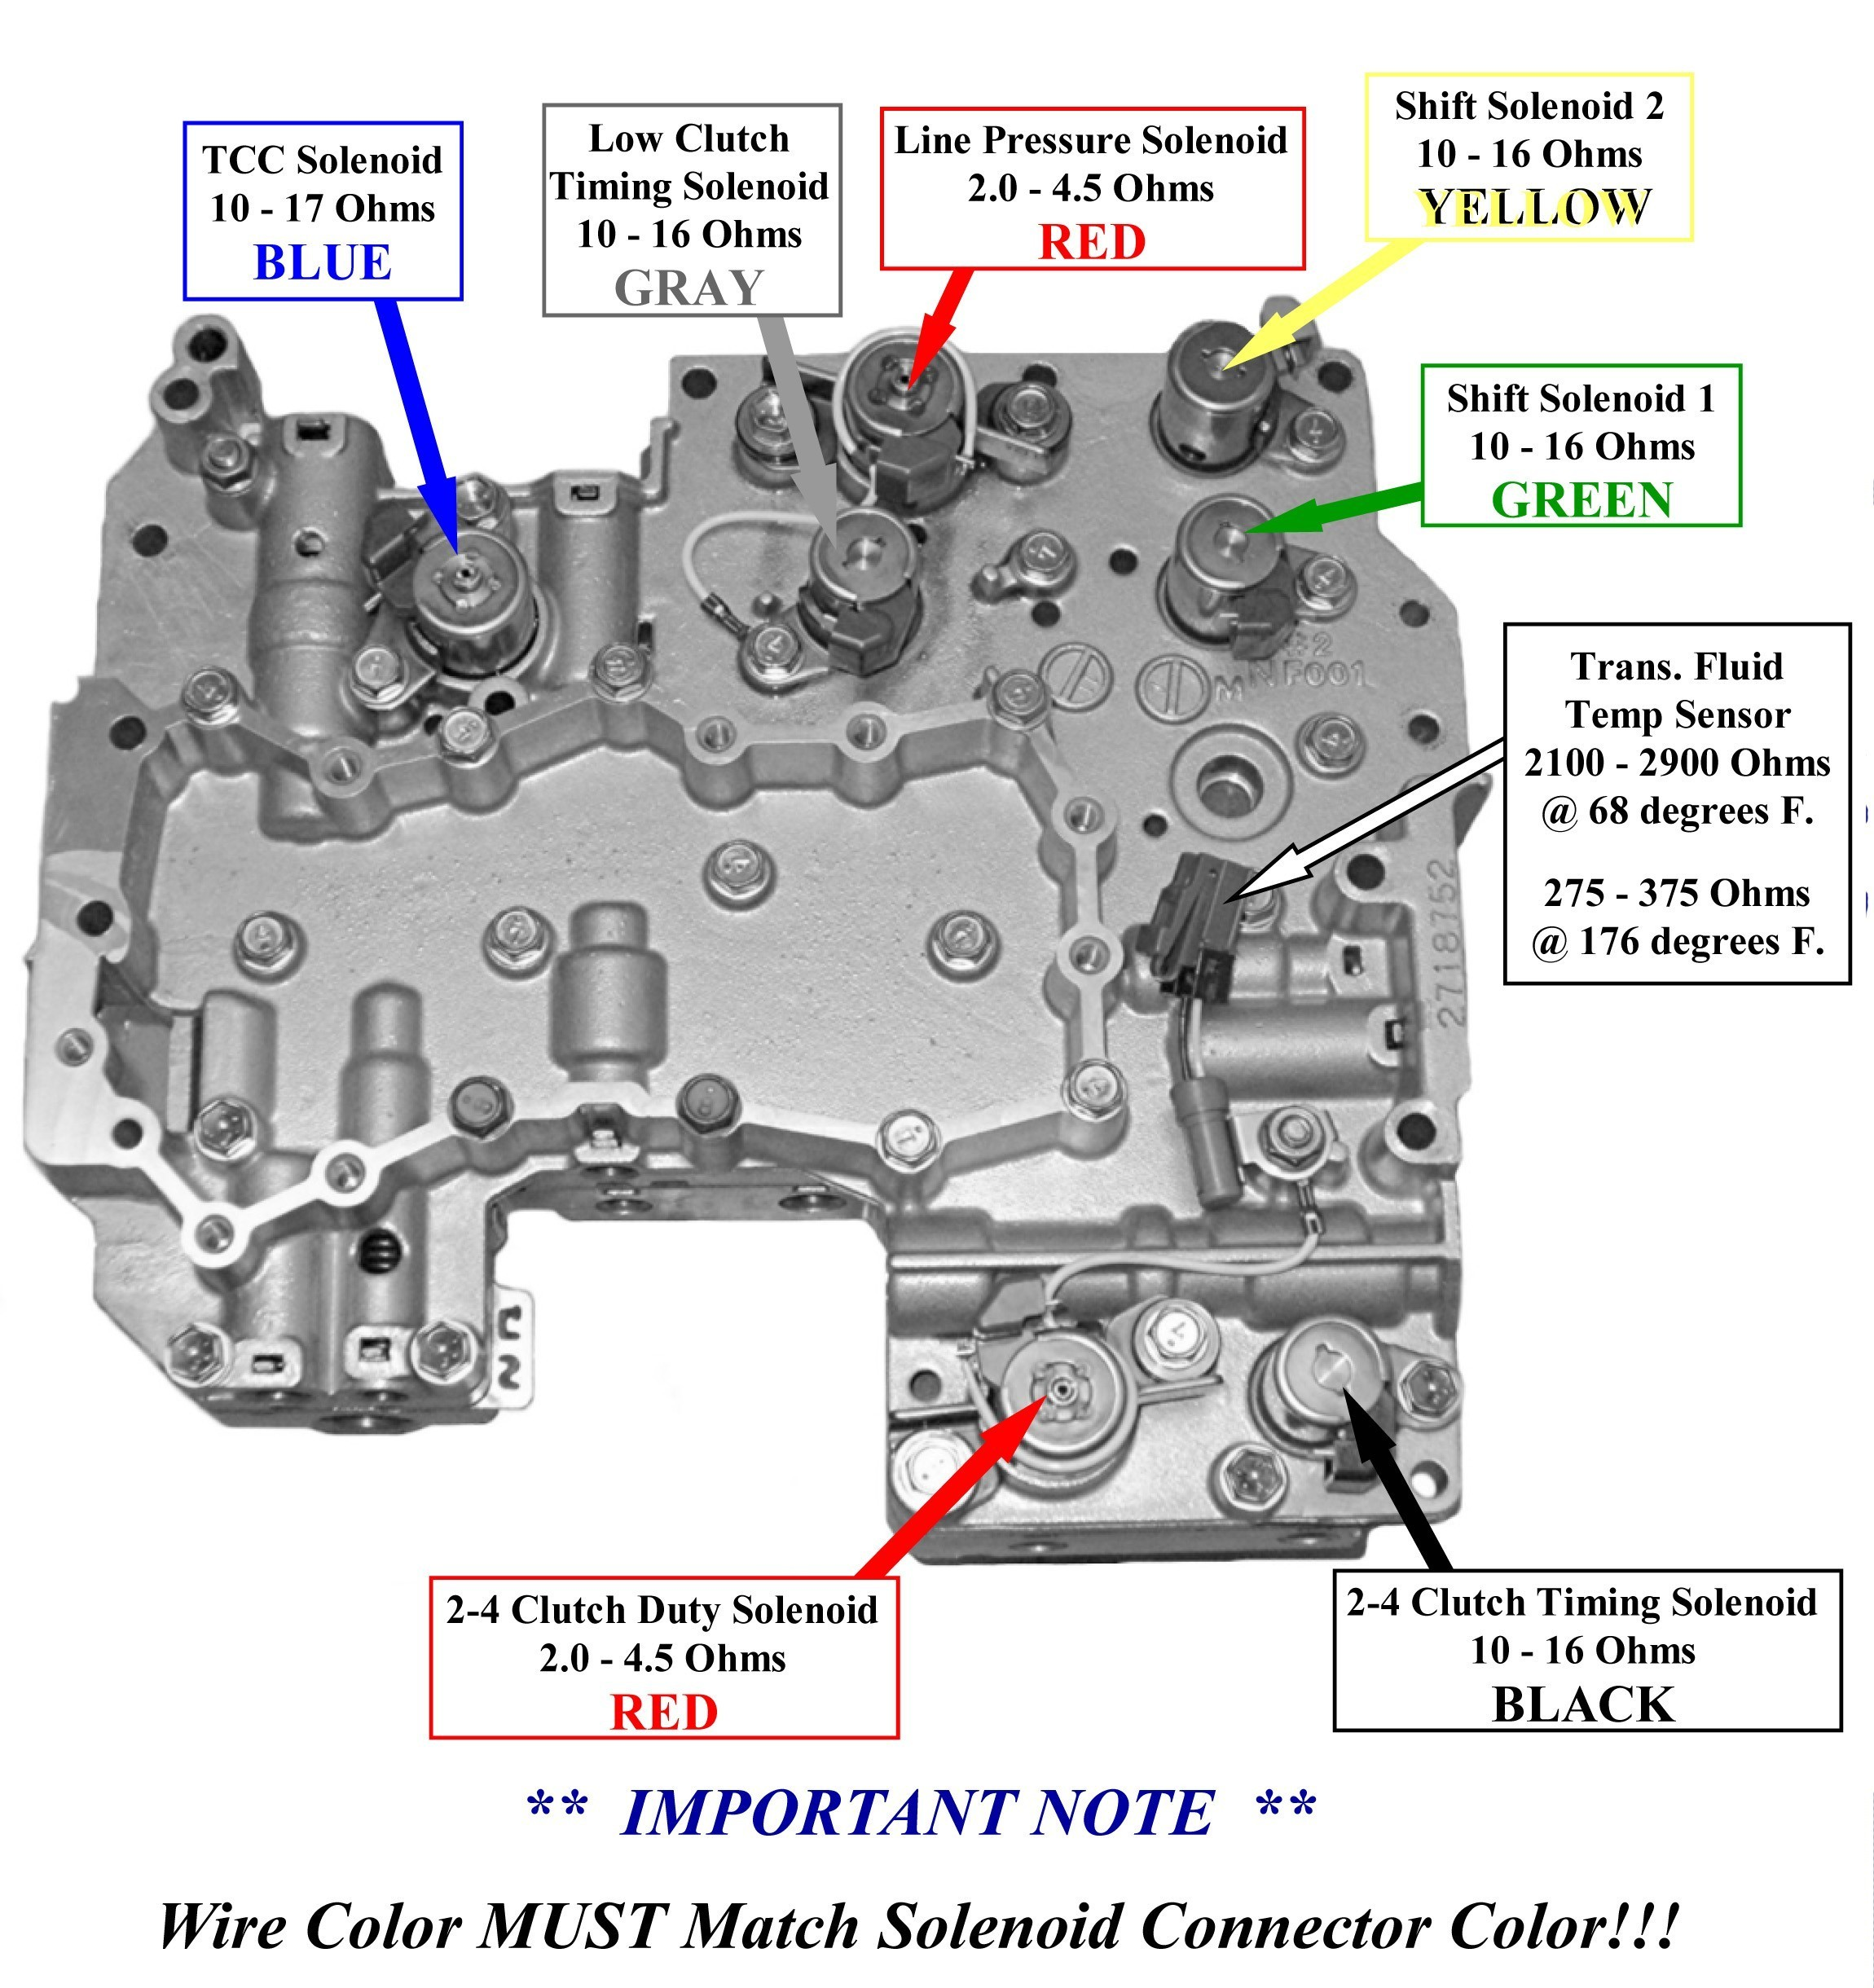 2001 Subaru Outback Engine Diagram 2001 Subaru Outback Parts Diagram 2002  Subaru Outback Parts Diagram